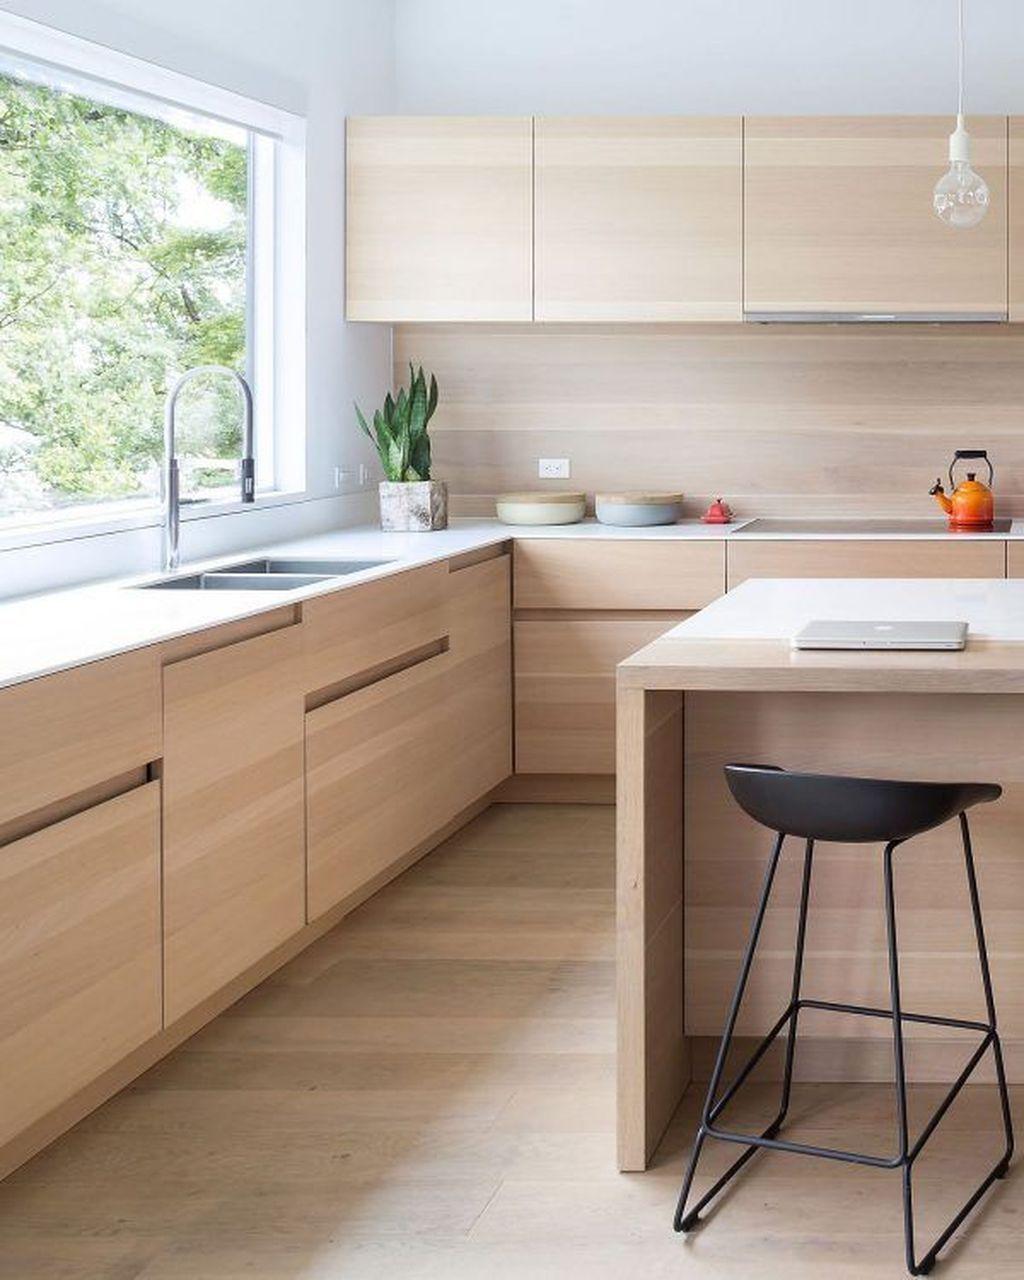 45 good minimalist kitchen designs in 2020 modern kitchen cabinets minimalist kitchen design on kitchen ideas minimalist id=85501